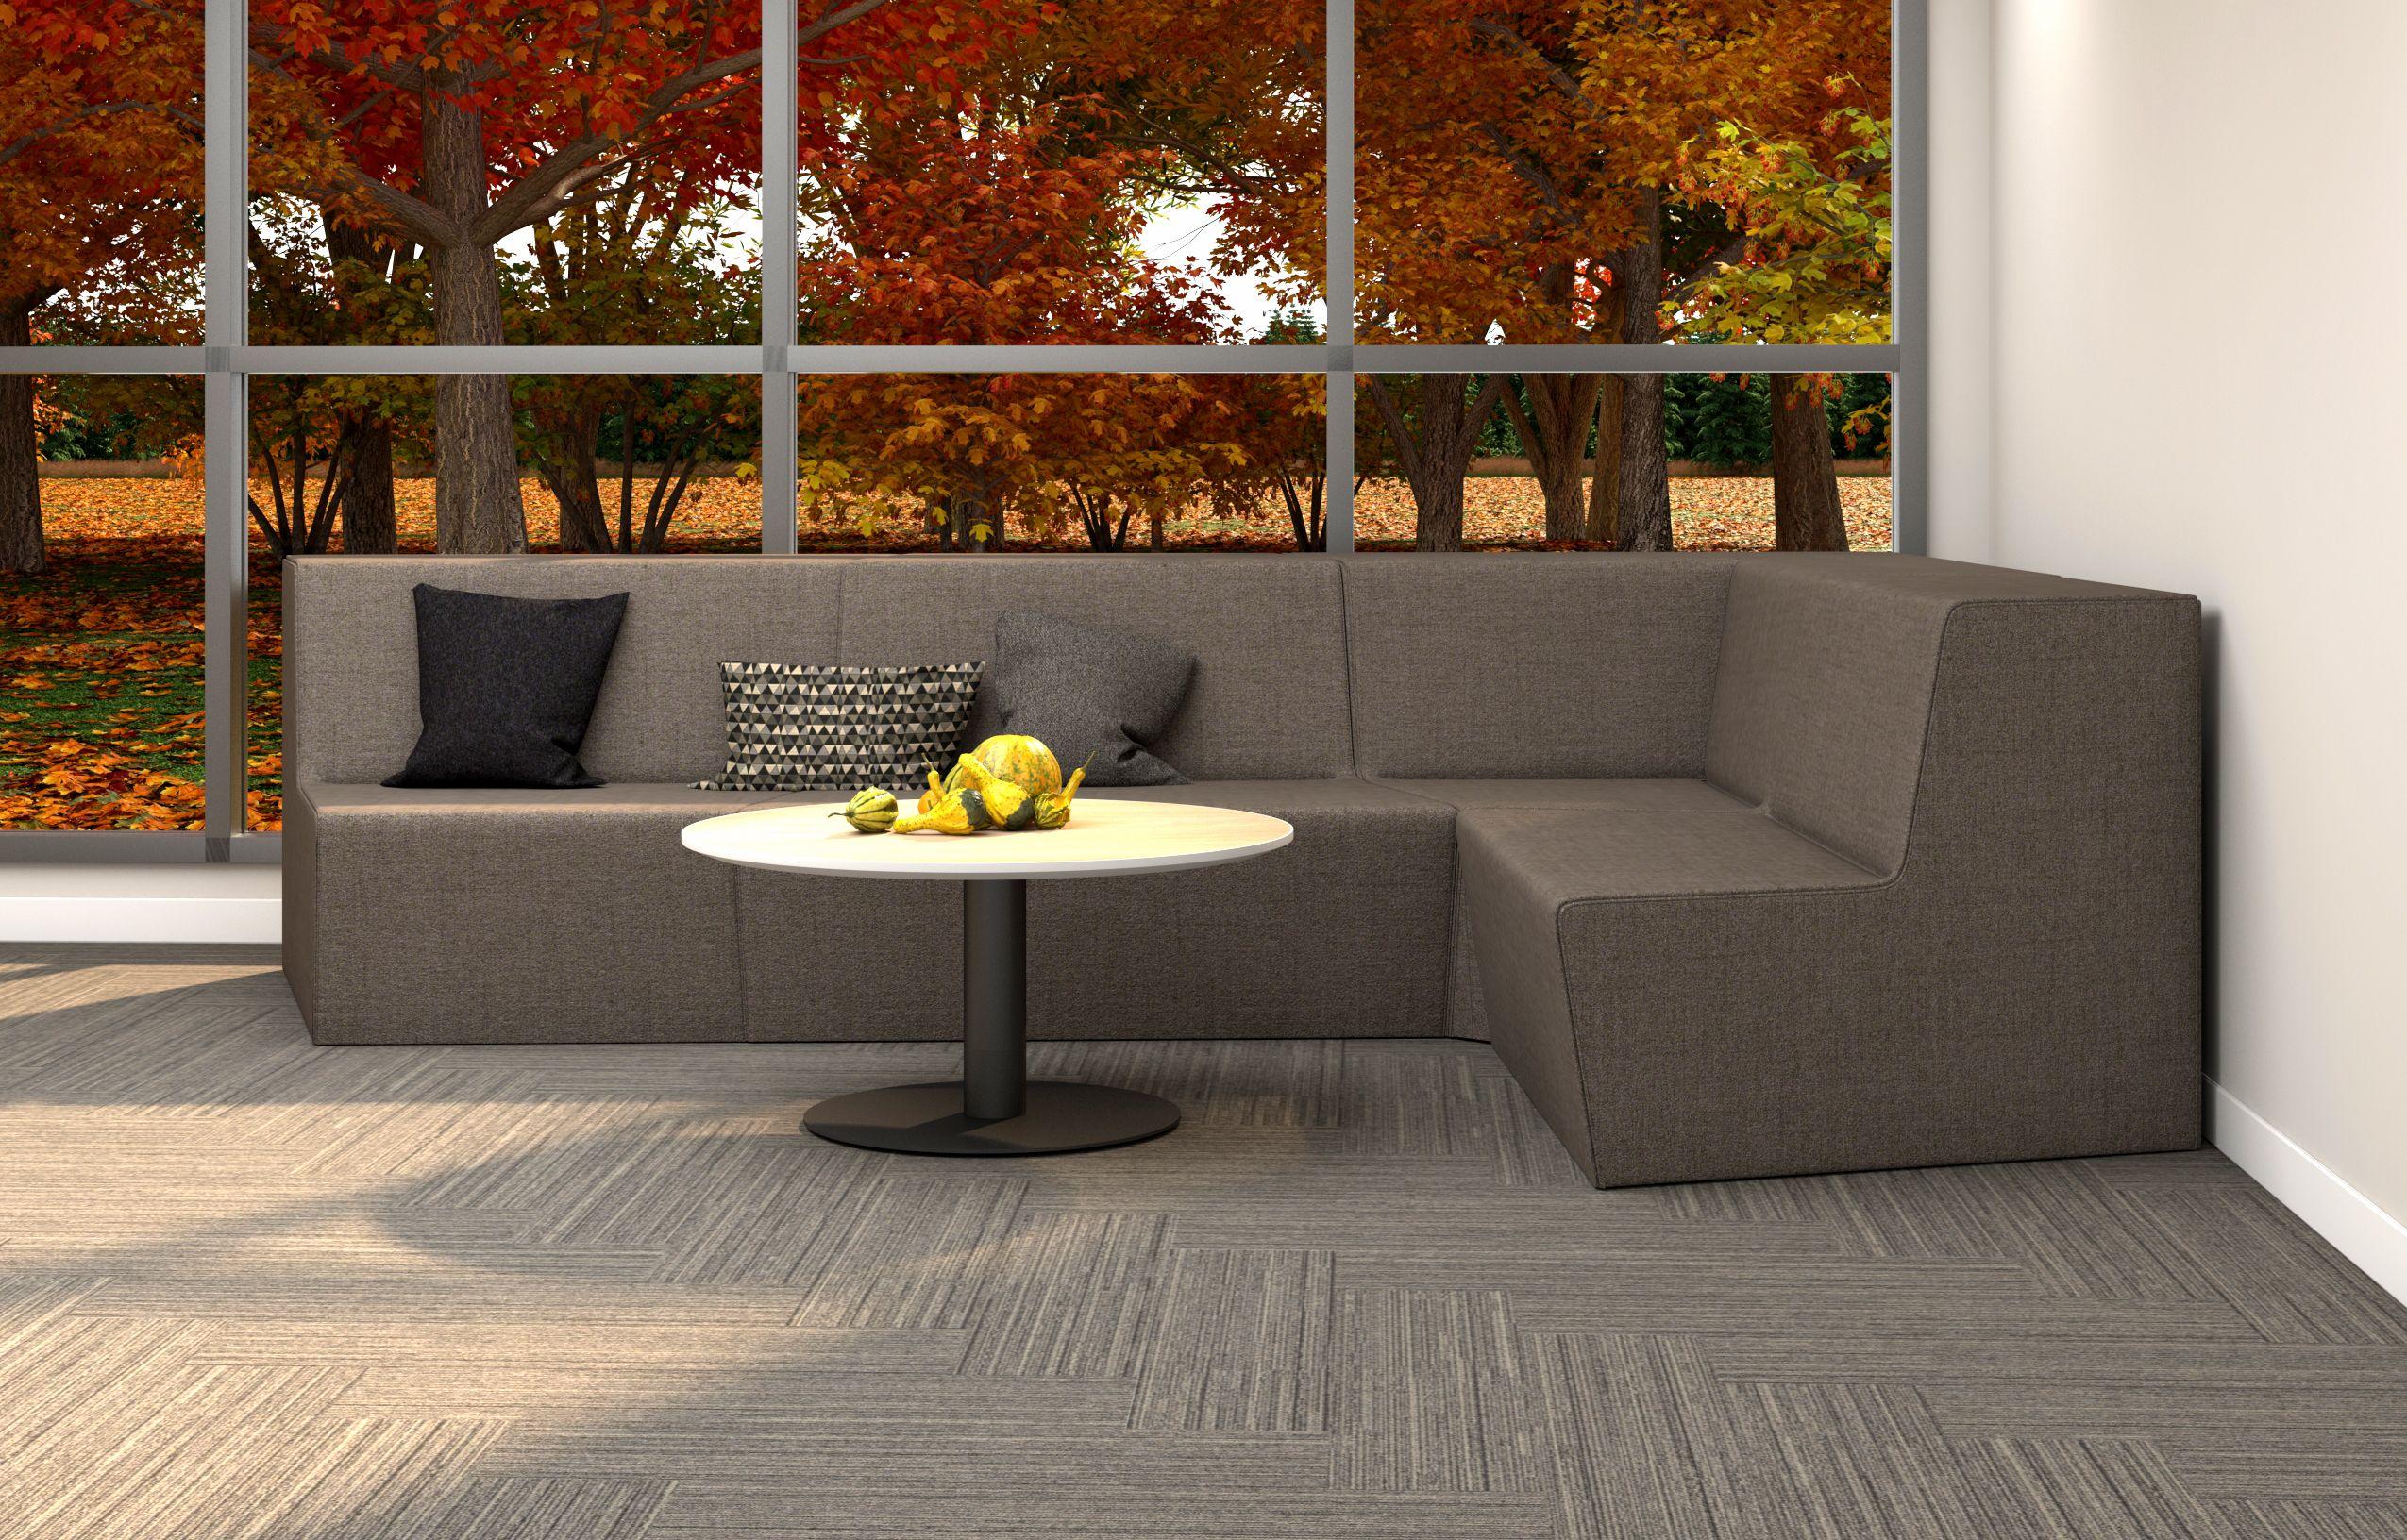 45+ Discount living room furniture sets ideas